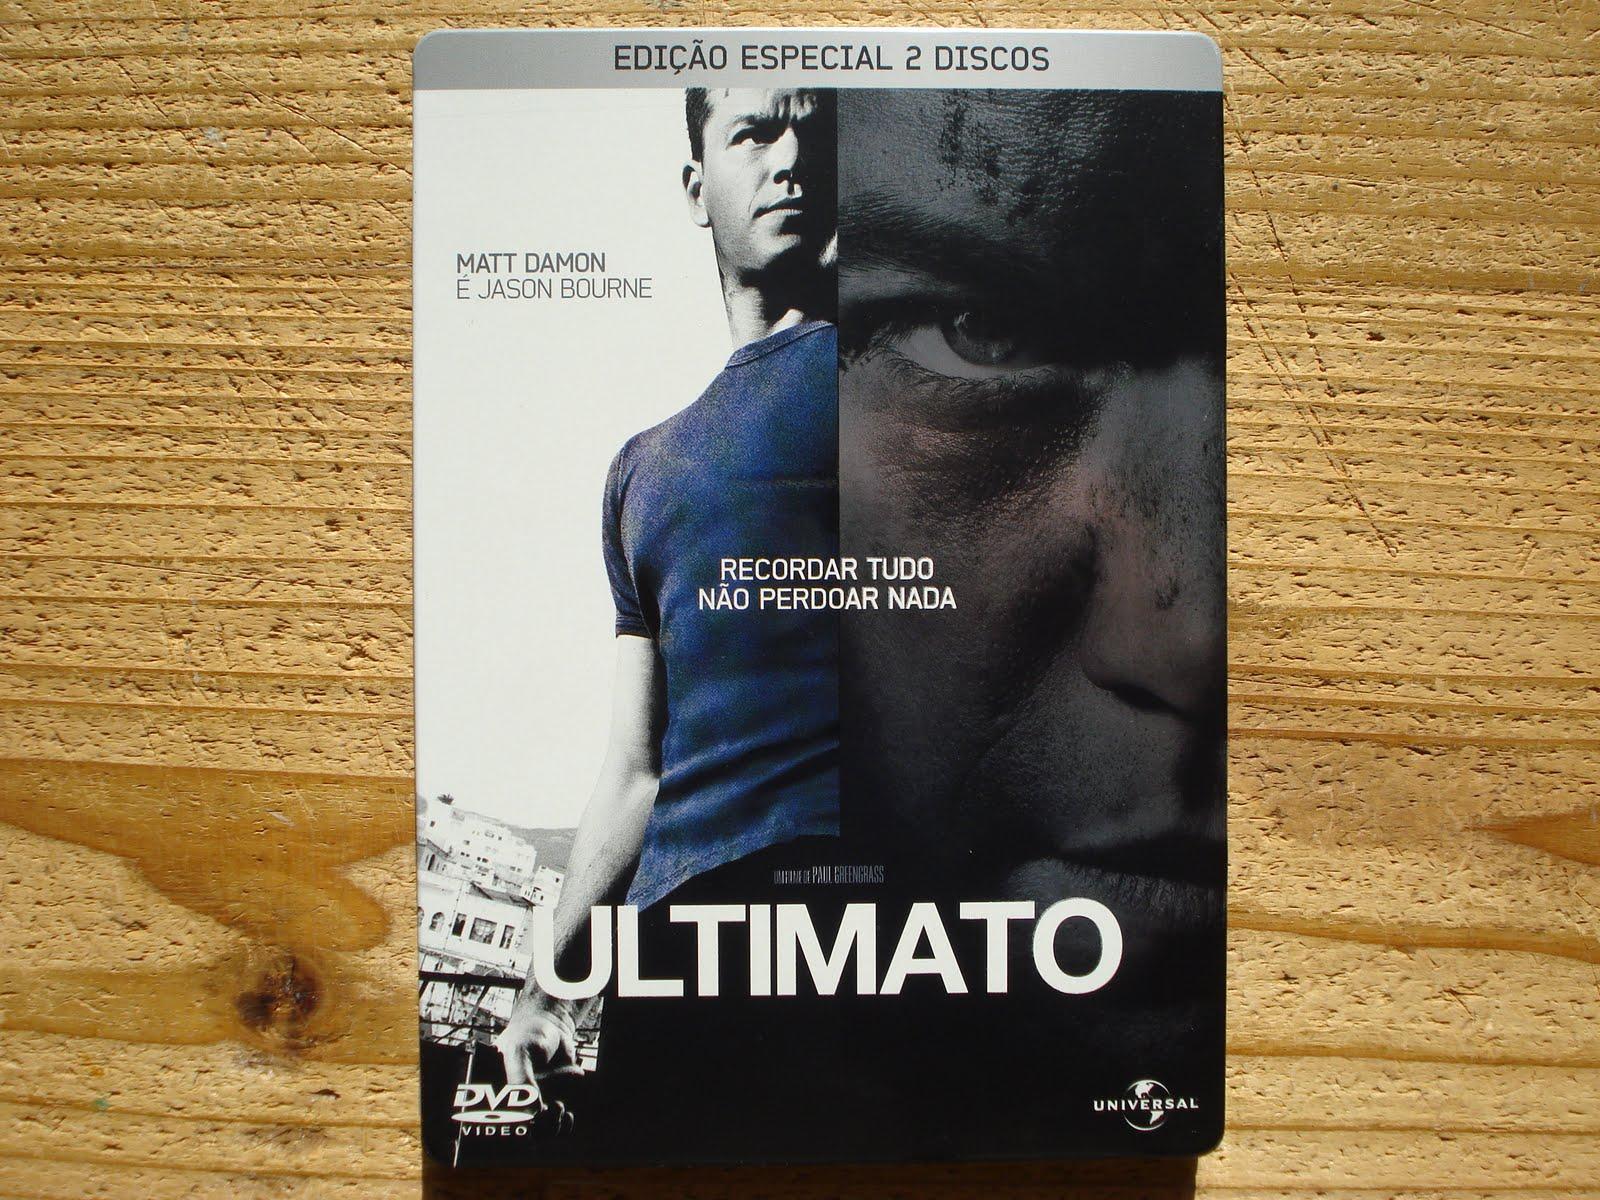 NELIO's COLLECTION: The Bourne Ultimatum (R2 PT)